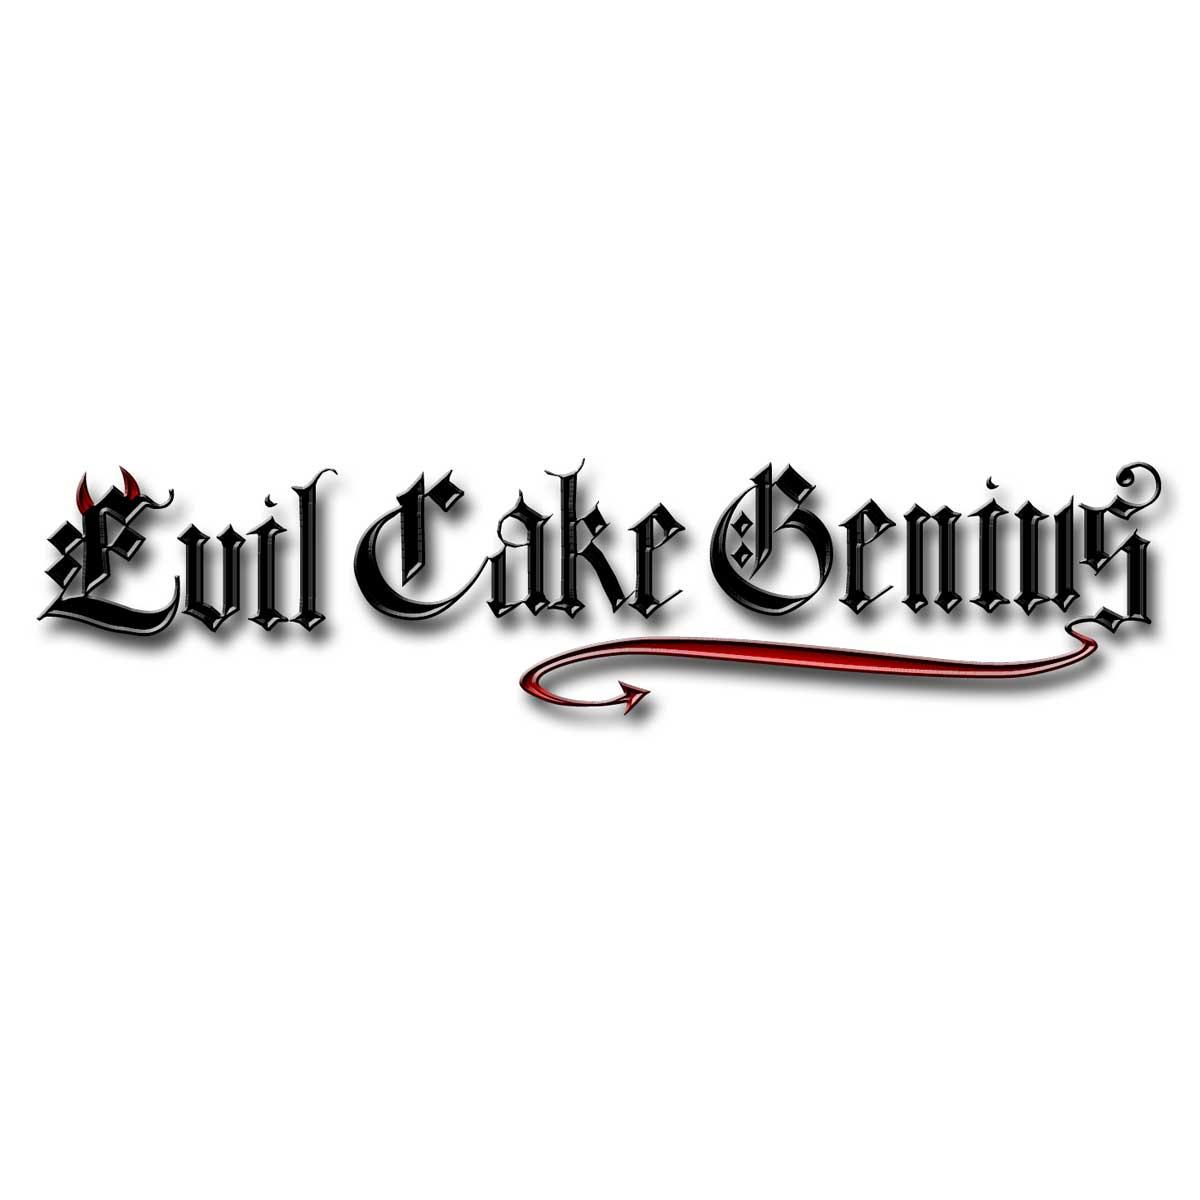 Round Cake Sketching Templates v 2.0